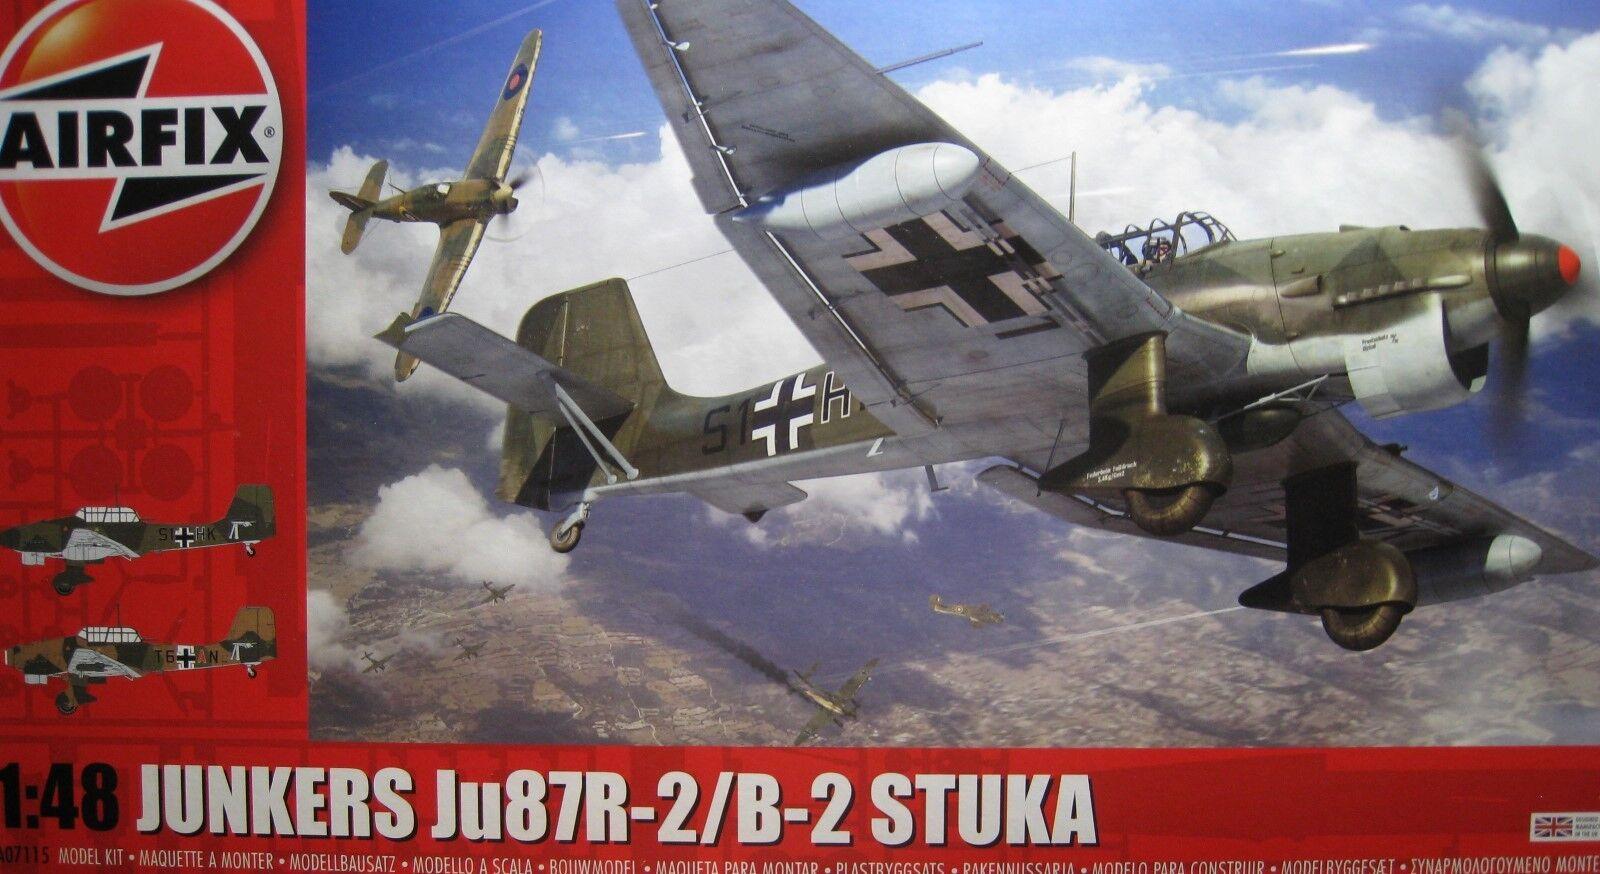 1 48 Junkers Ju87R-2 B-2 Stuka Model Kit by Airfix A07115